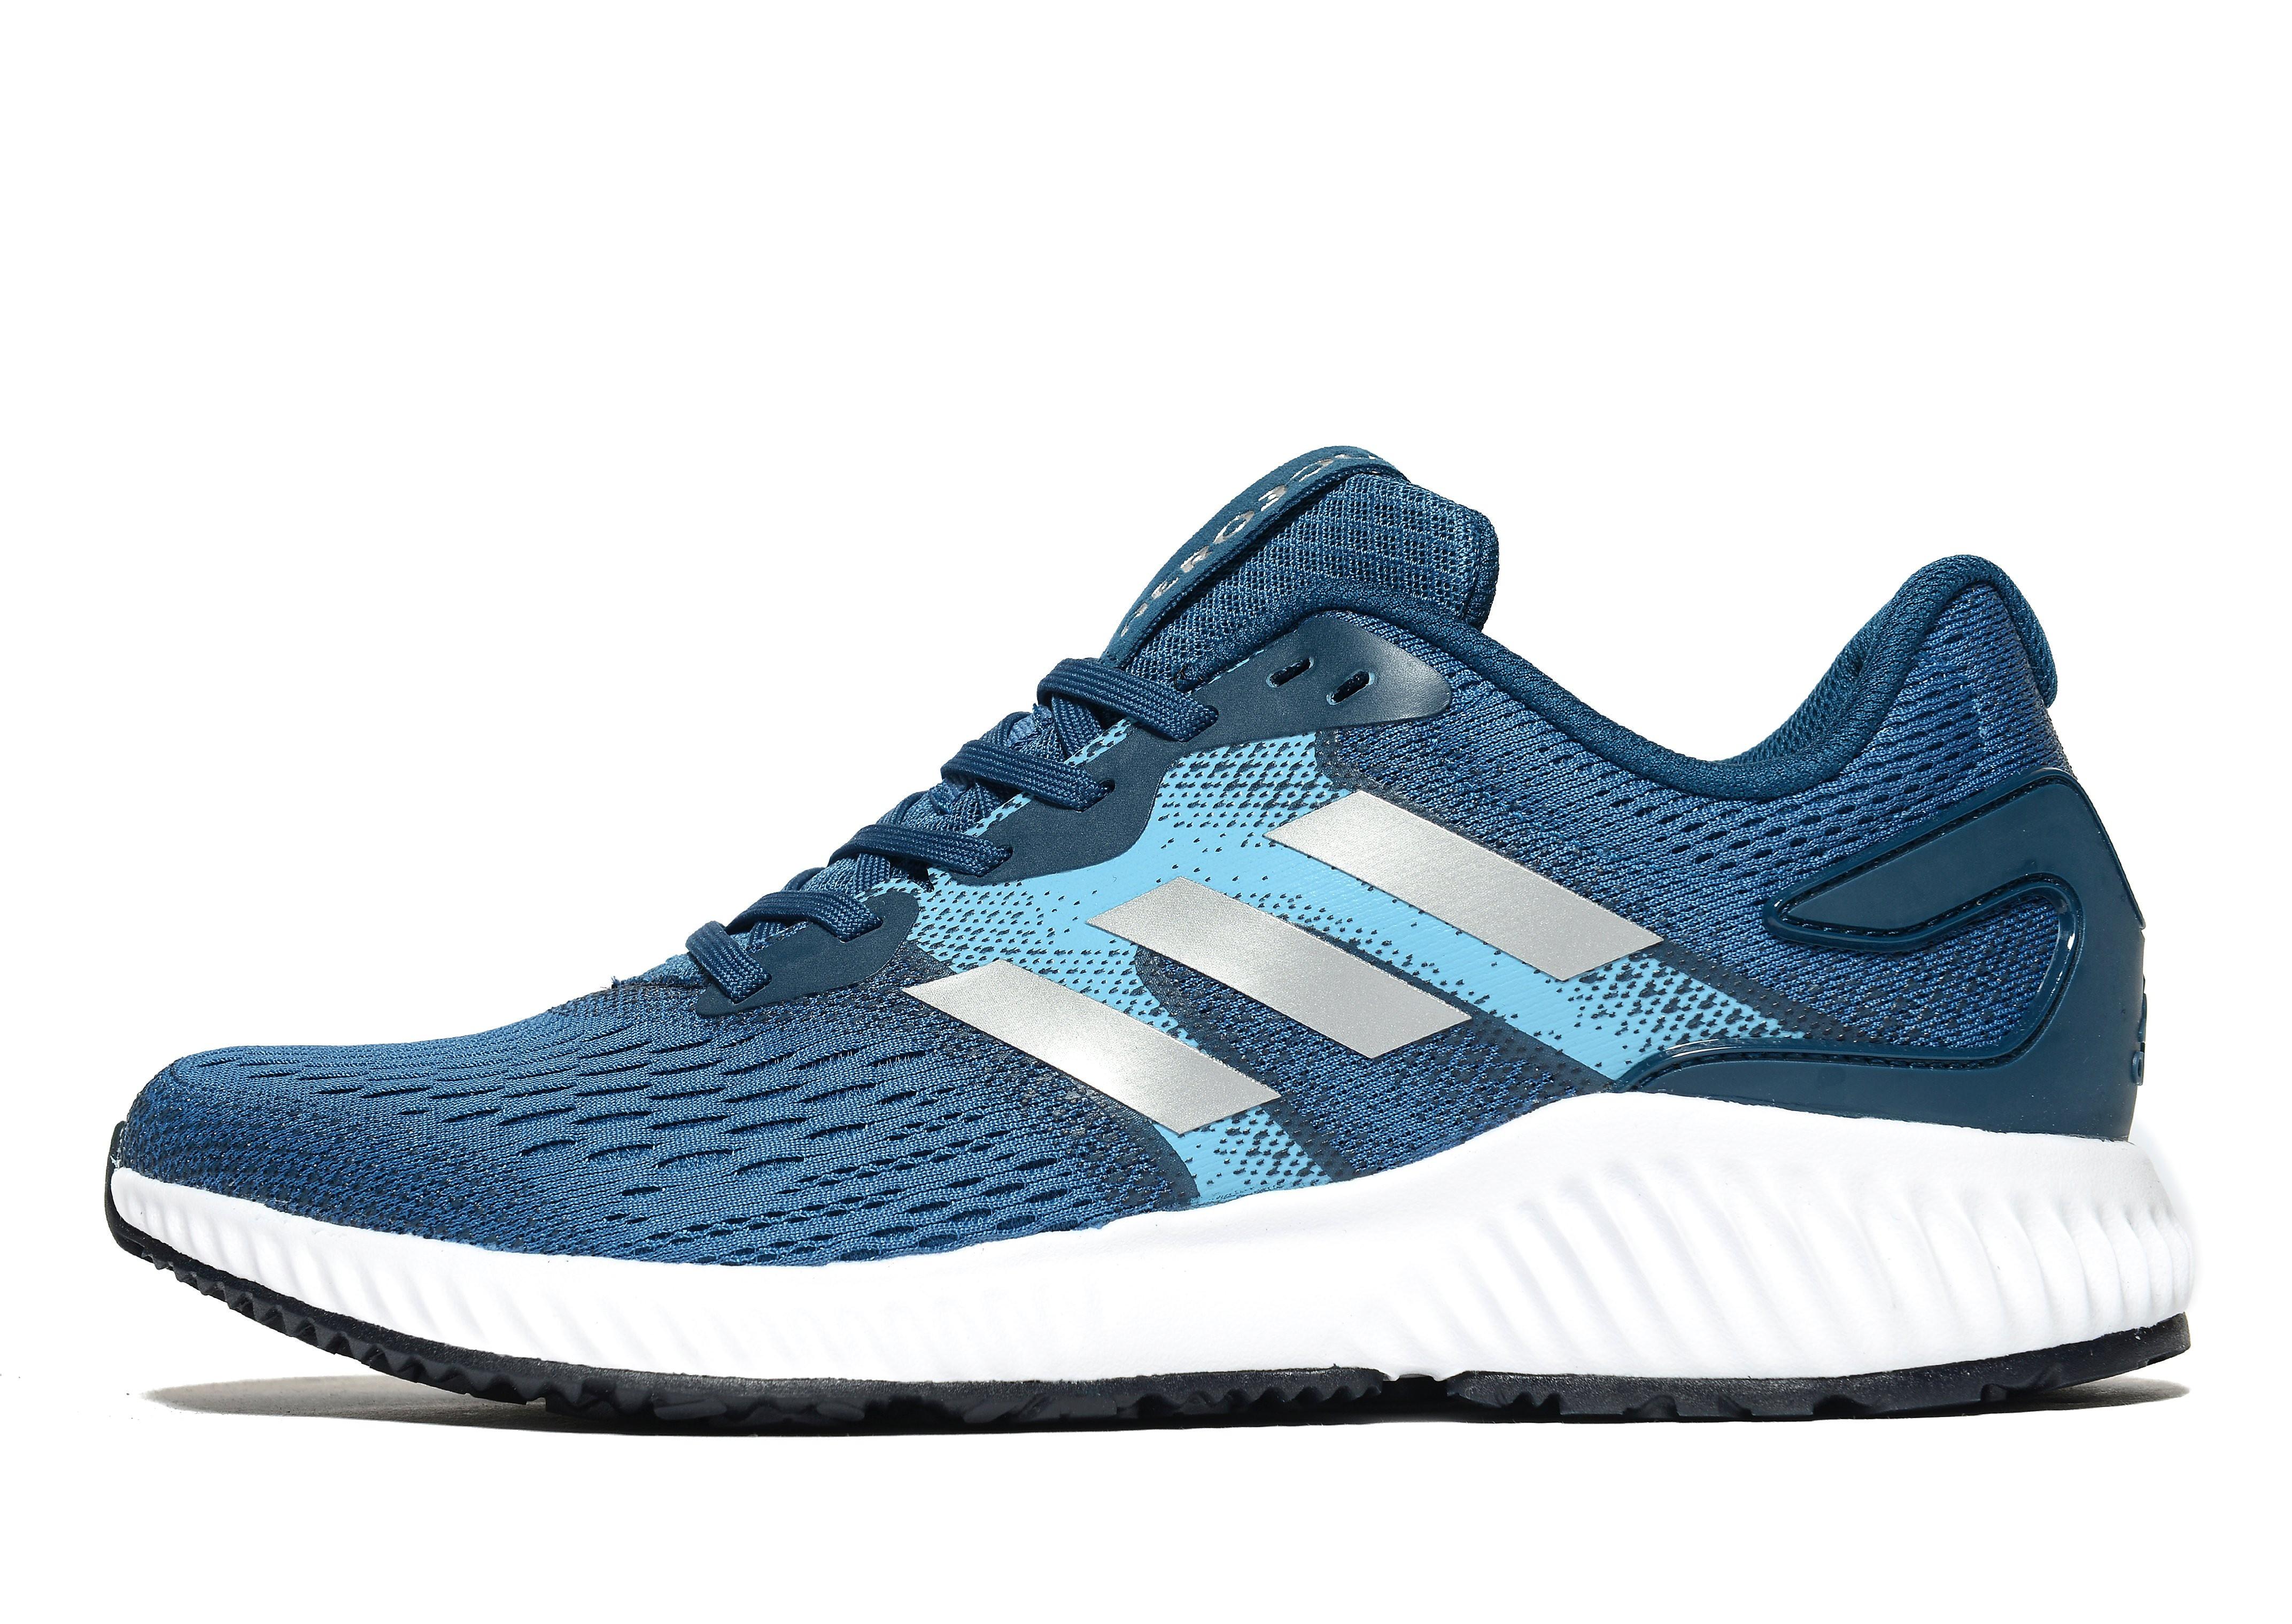 adidas Aerobounce Running Shoes